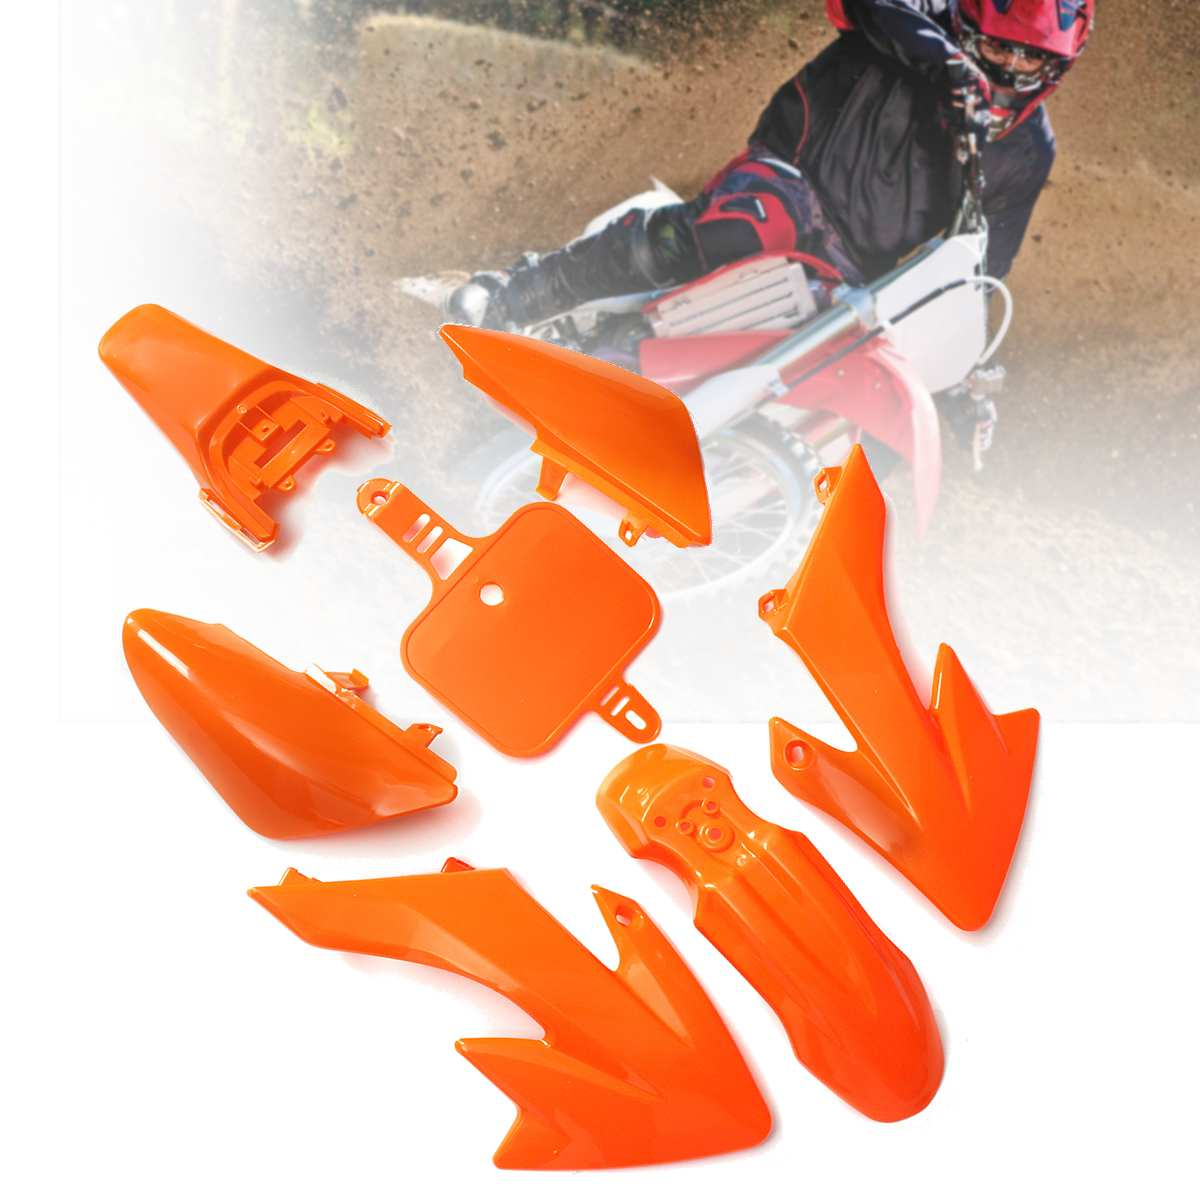 Orange Plastics -Fender Fairing Kit For HONDA CRF XR 50 CRF50 125 SSR SDG 107 PIT BIKE tdr tall seat plastics fender gas fuel tank for honda crf50 crf50 dirt pit bike motor quality 3pcs set free shipping